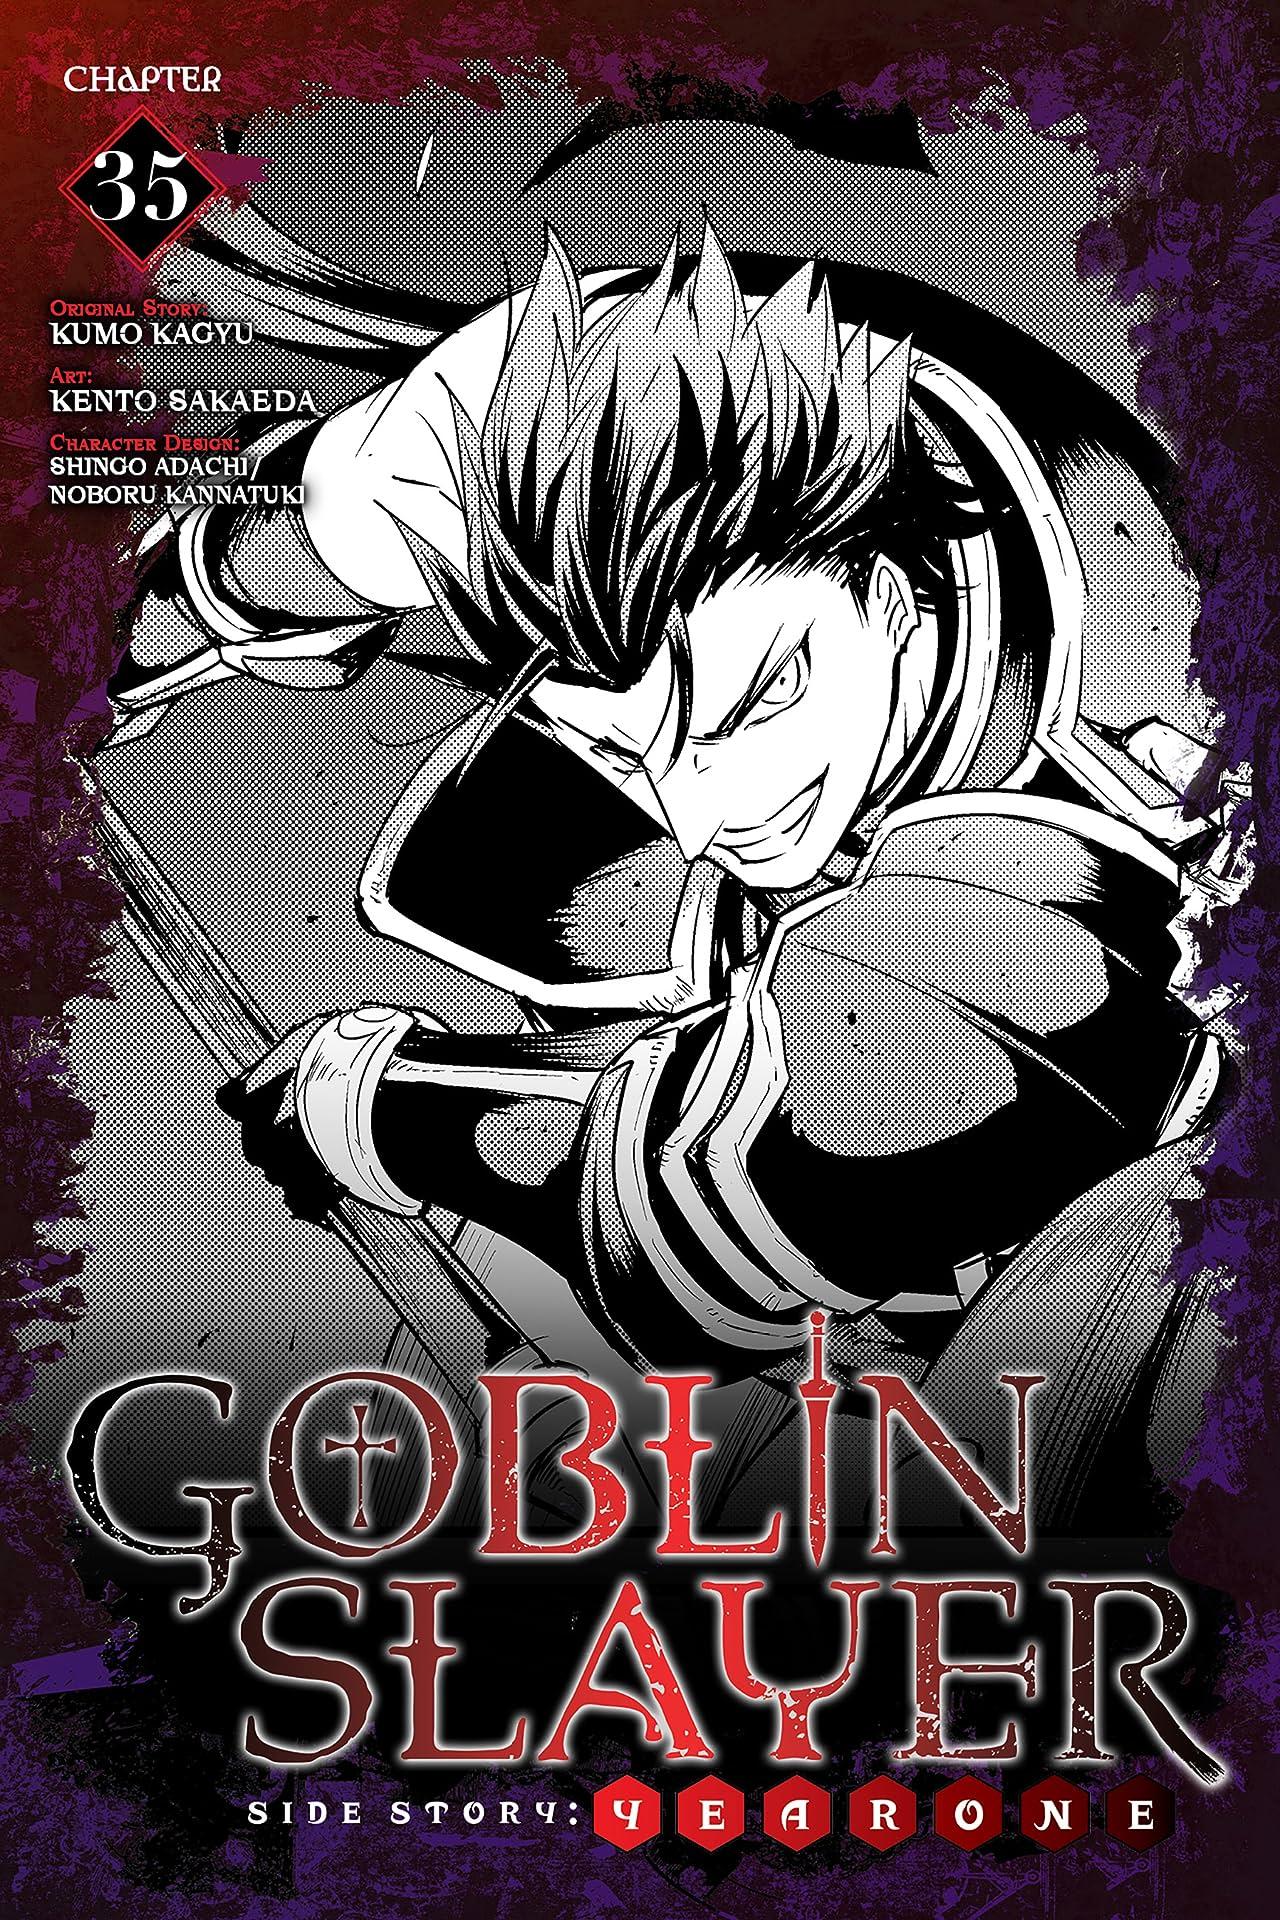 Goblin Slayer Side Story: Year One #35